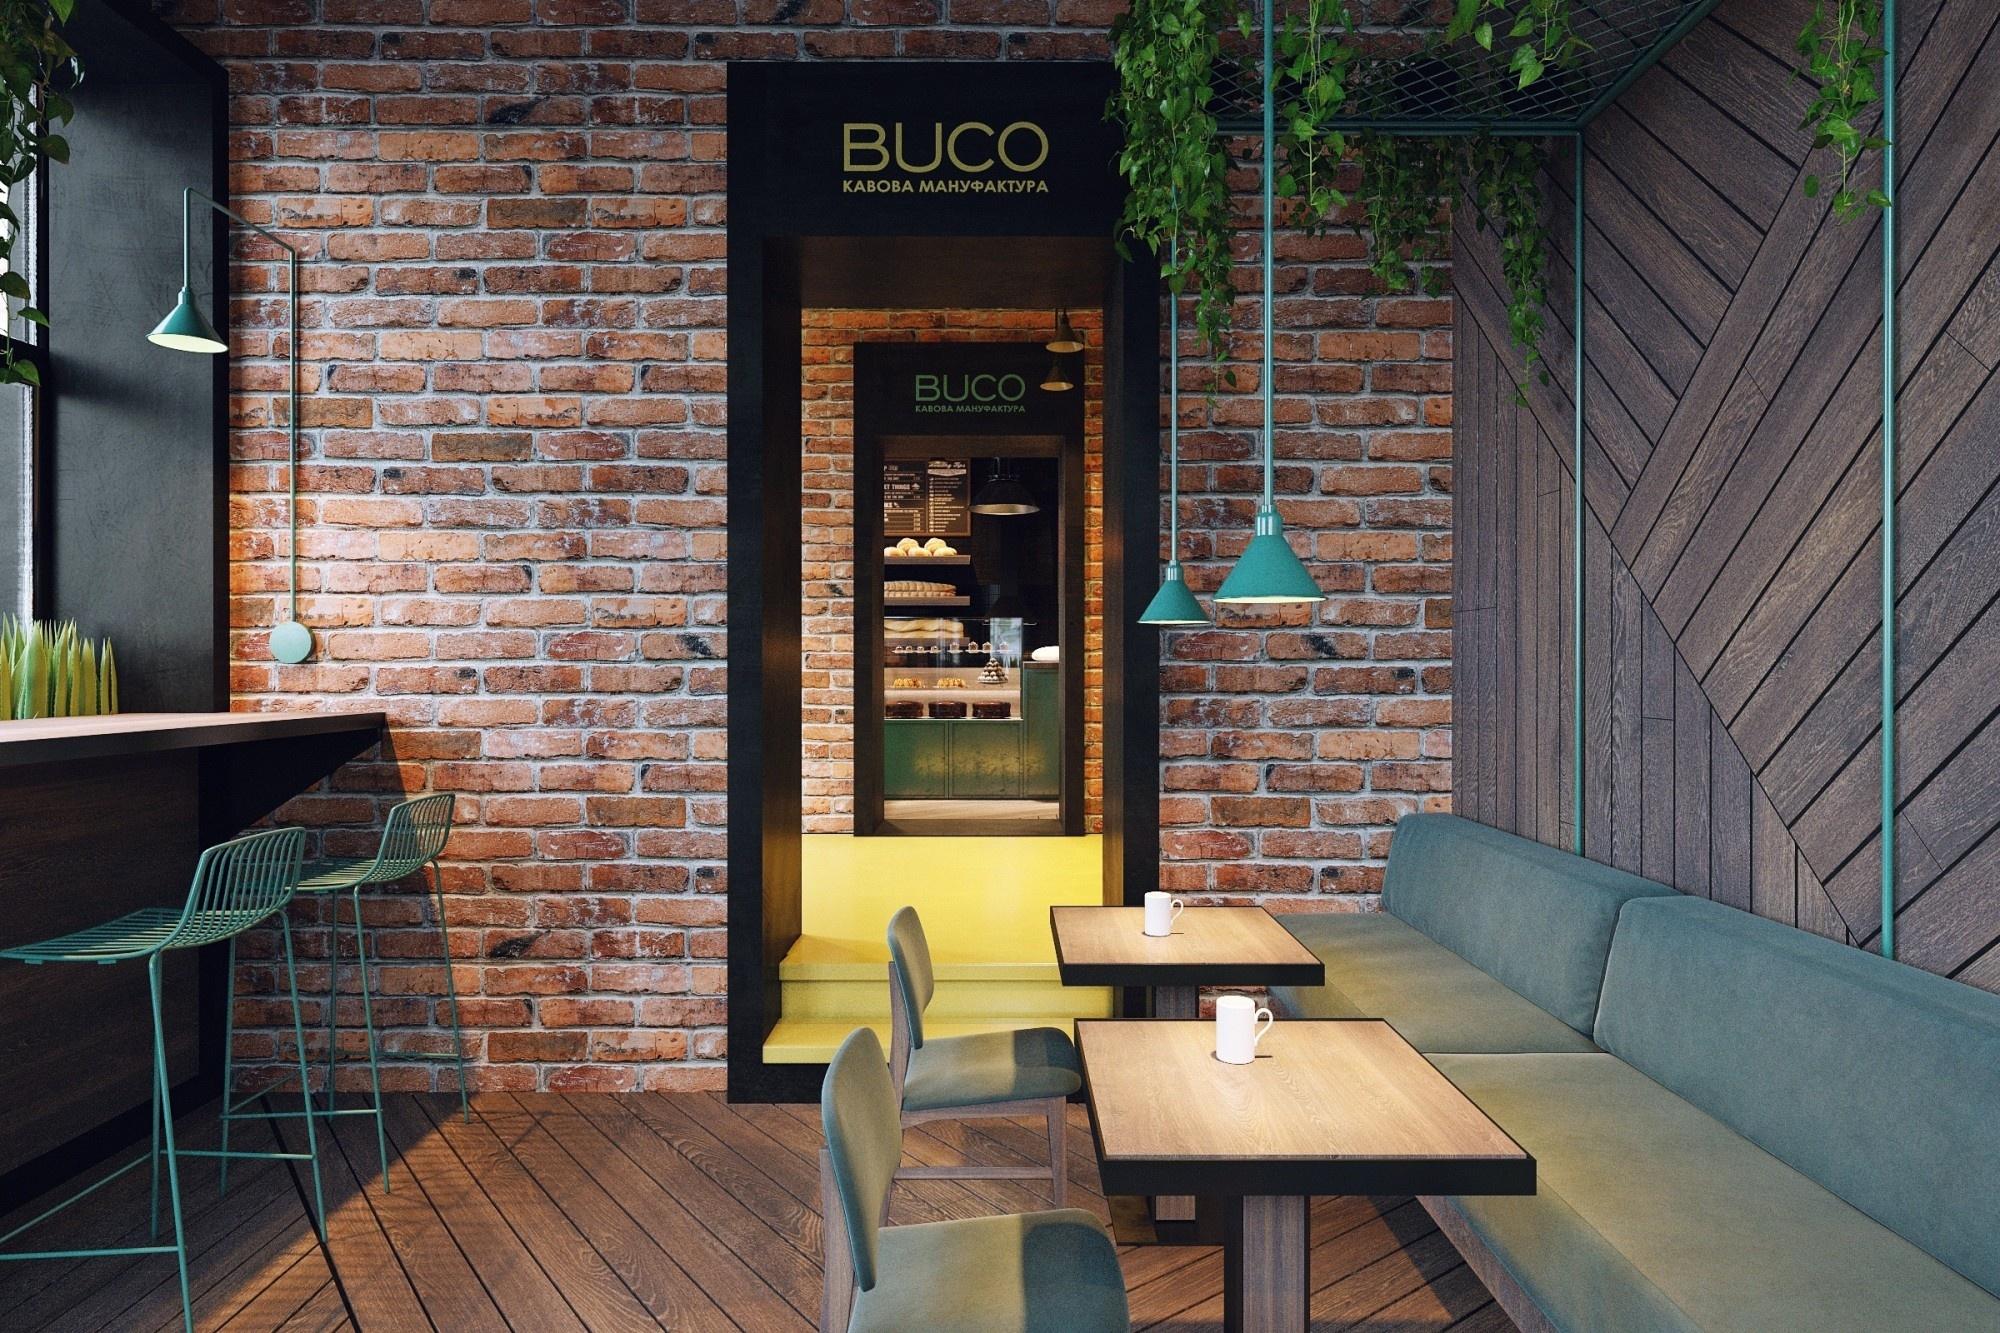 buco_2_view01_p_01